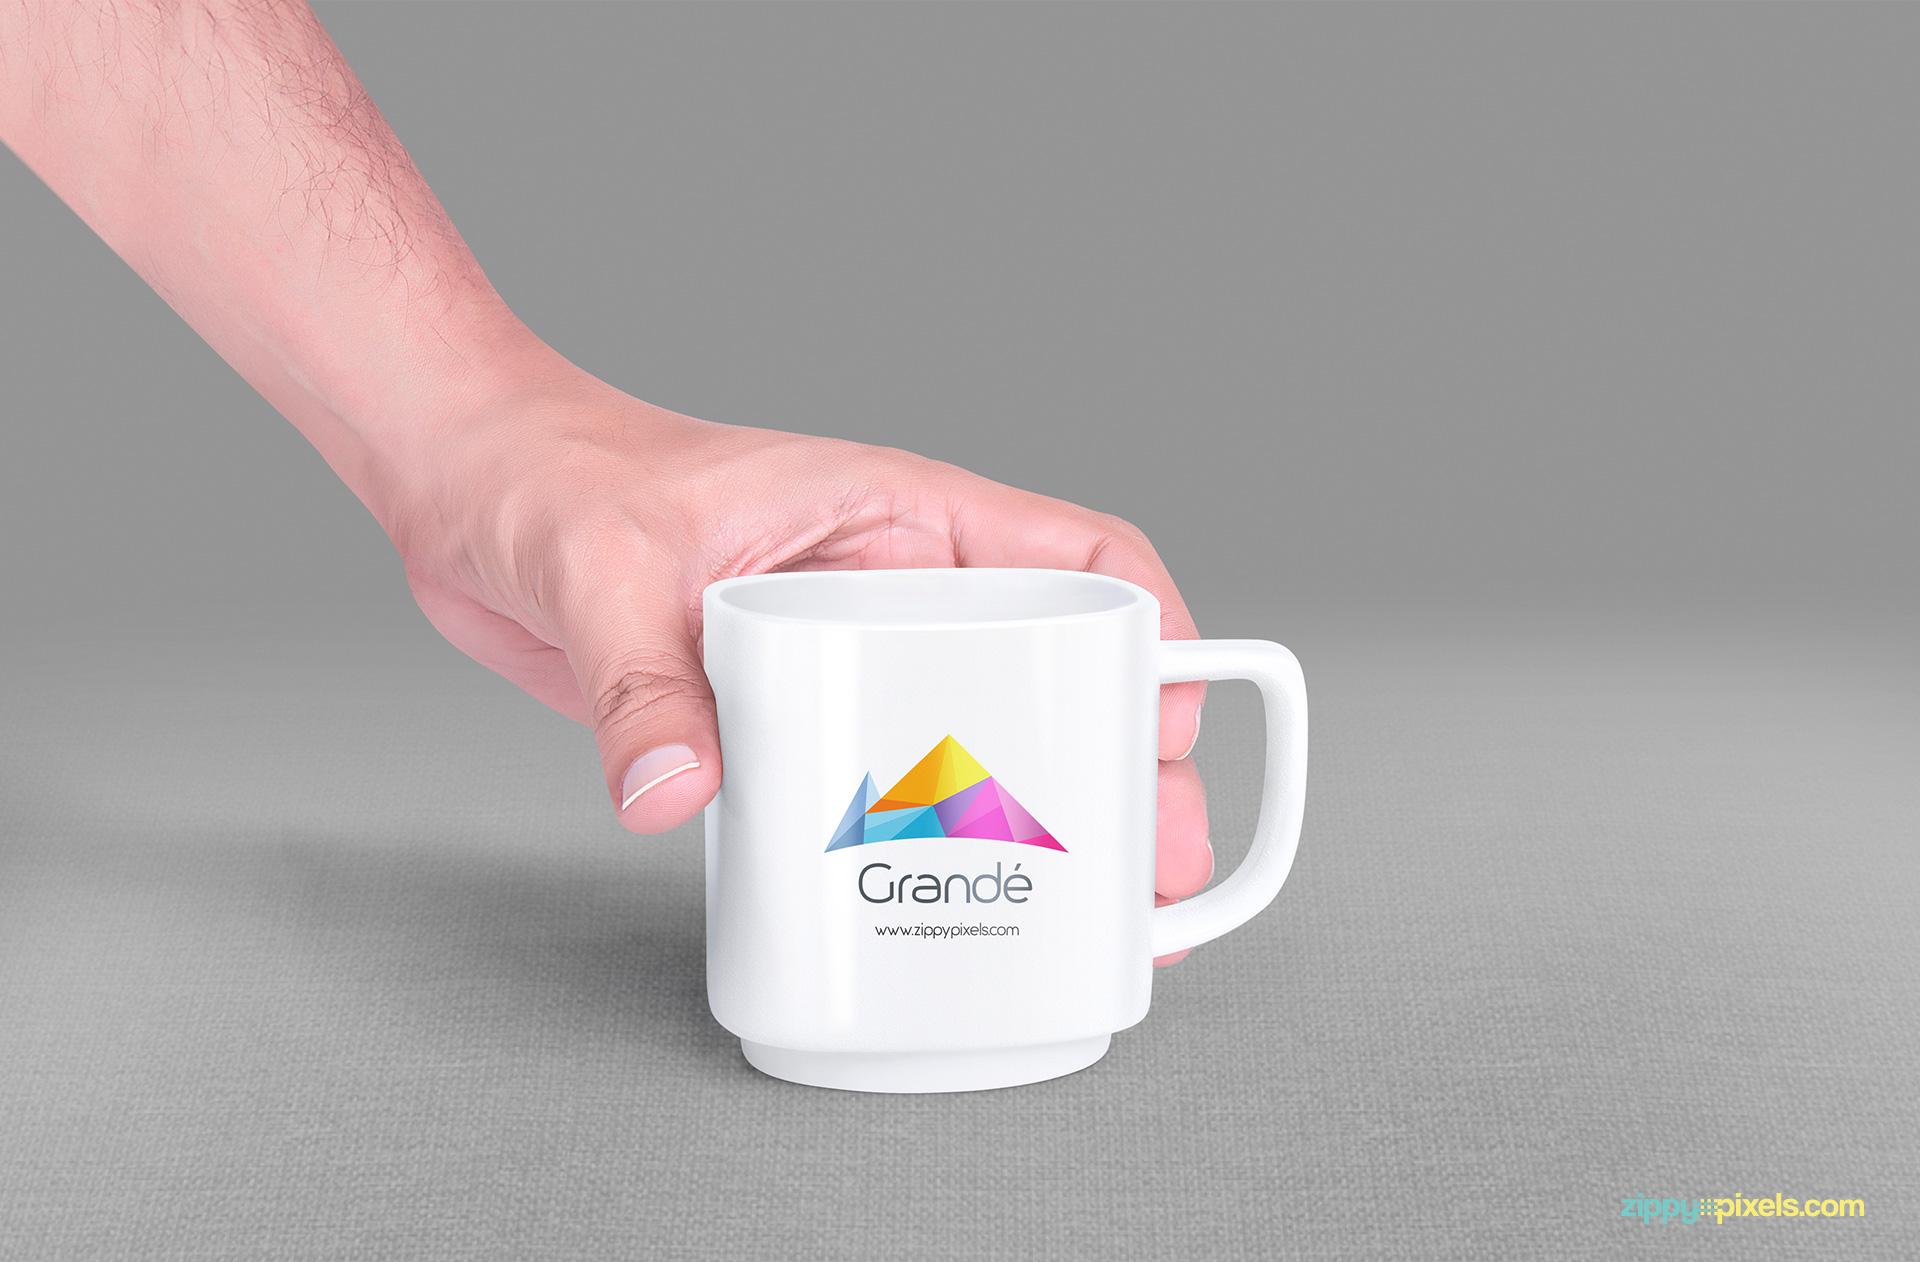 Free mug mock up with 7 handheld positions.